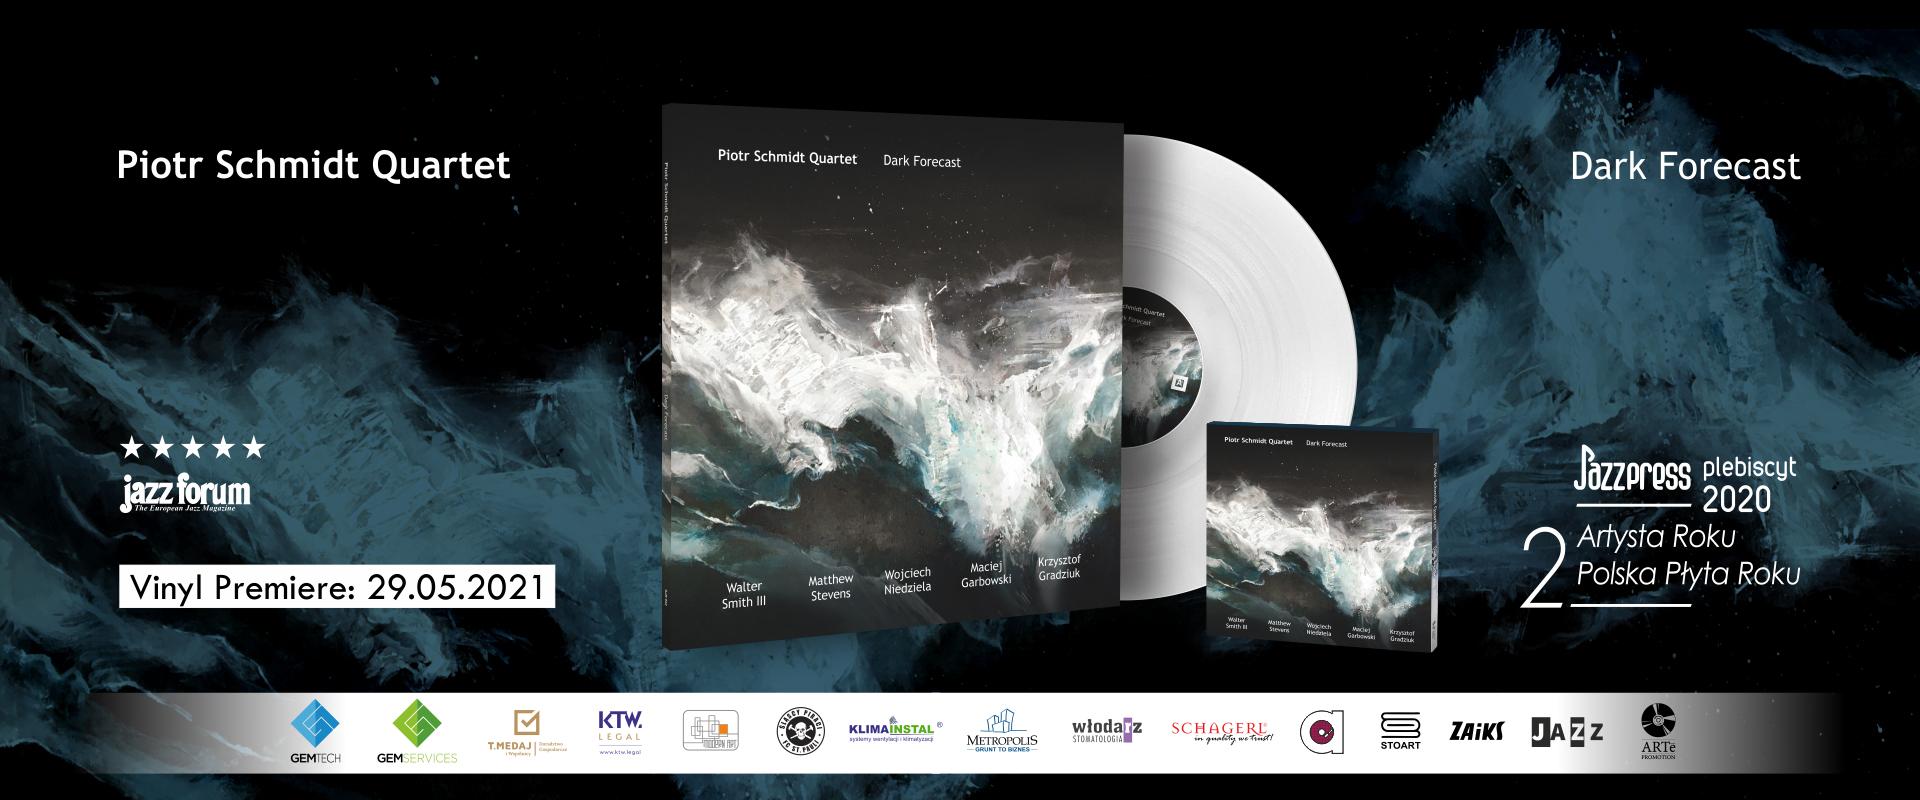 Piotr Schmidt Quartet - Dark Forecast vinyl